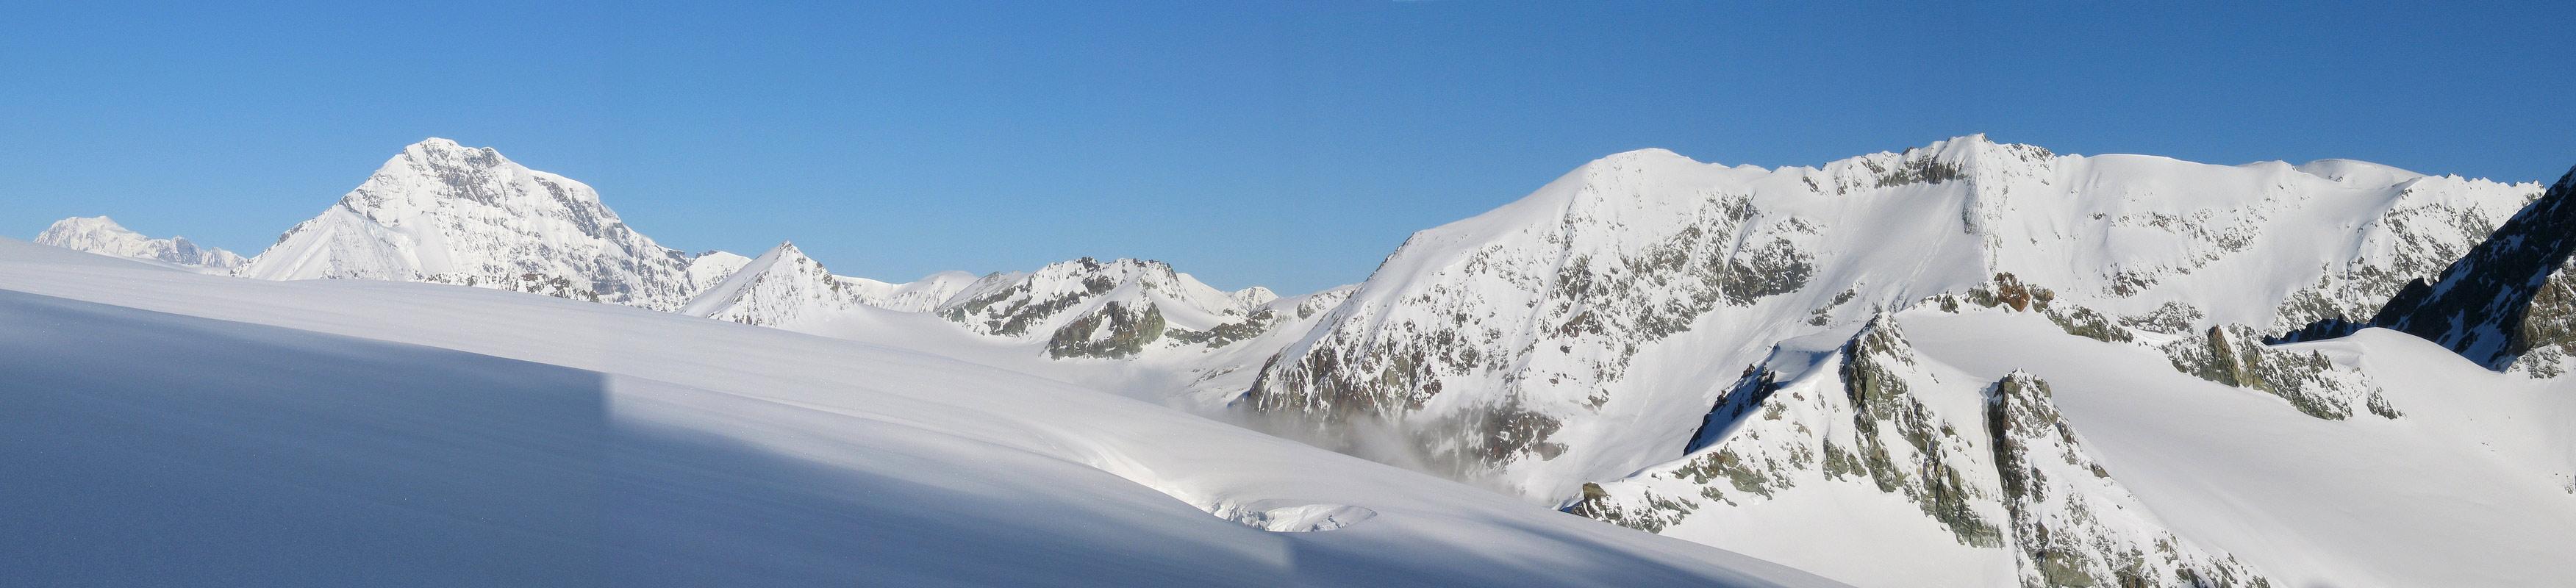 Col Valpelline, Day 6 H.R. Chamonix-Zermatt Walliser Alpen / Alpes valaisannes Švýcarsko panorama 28